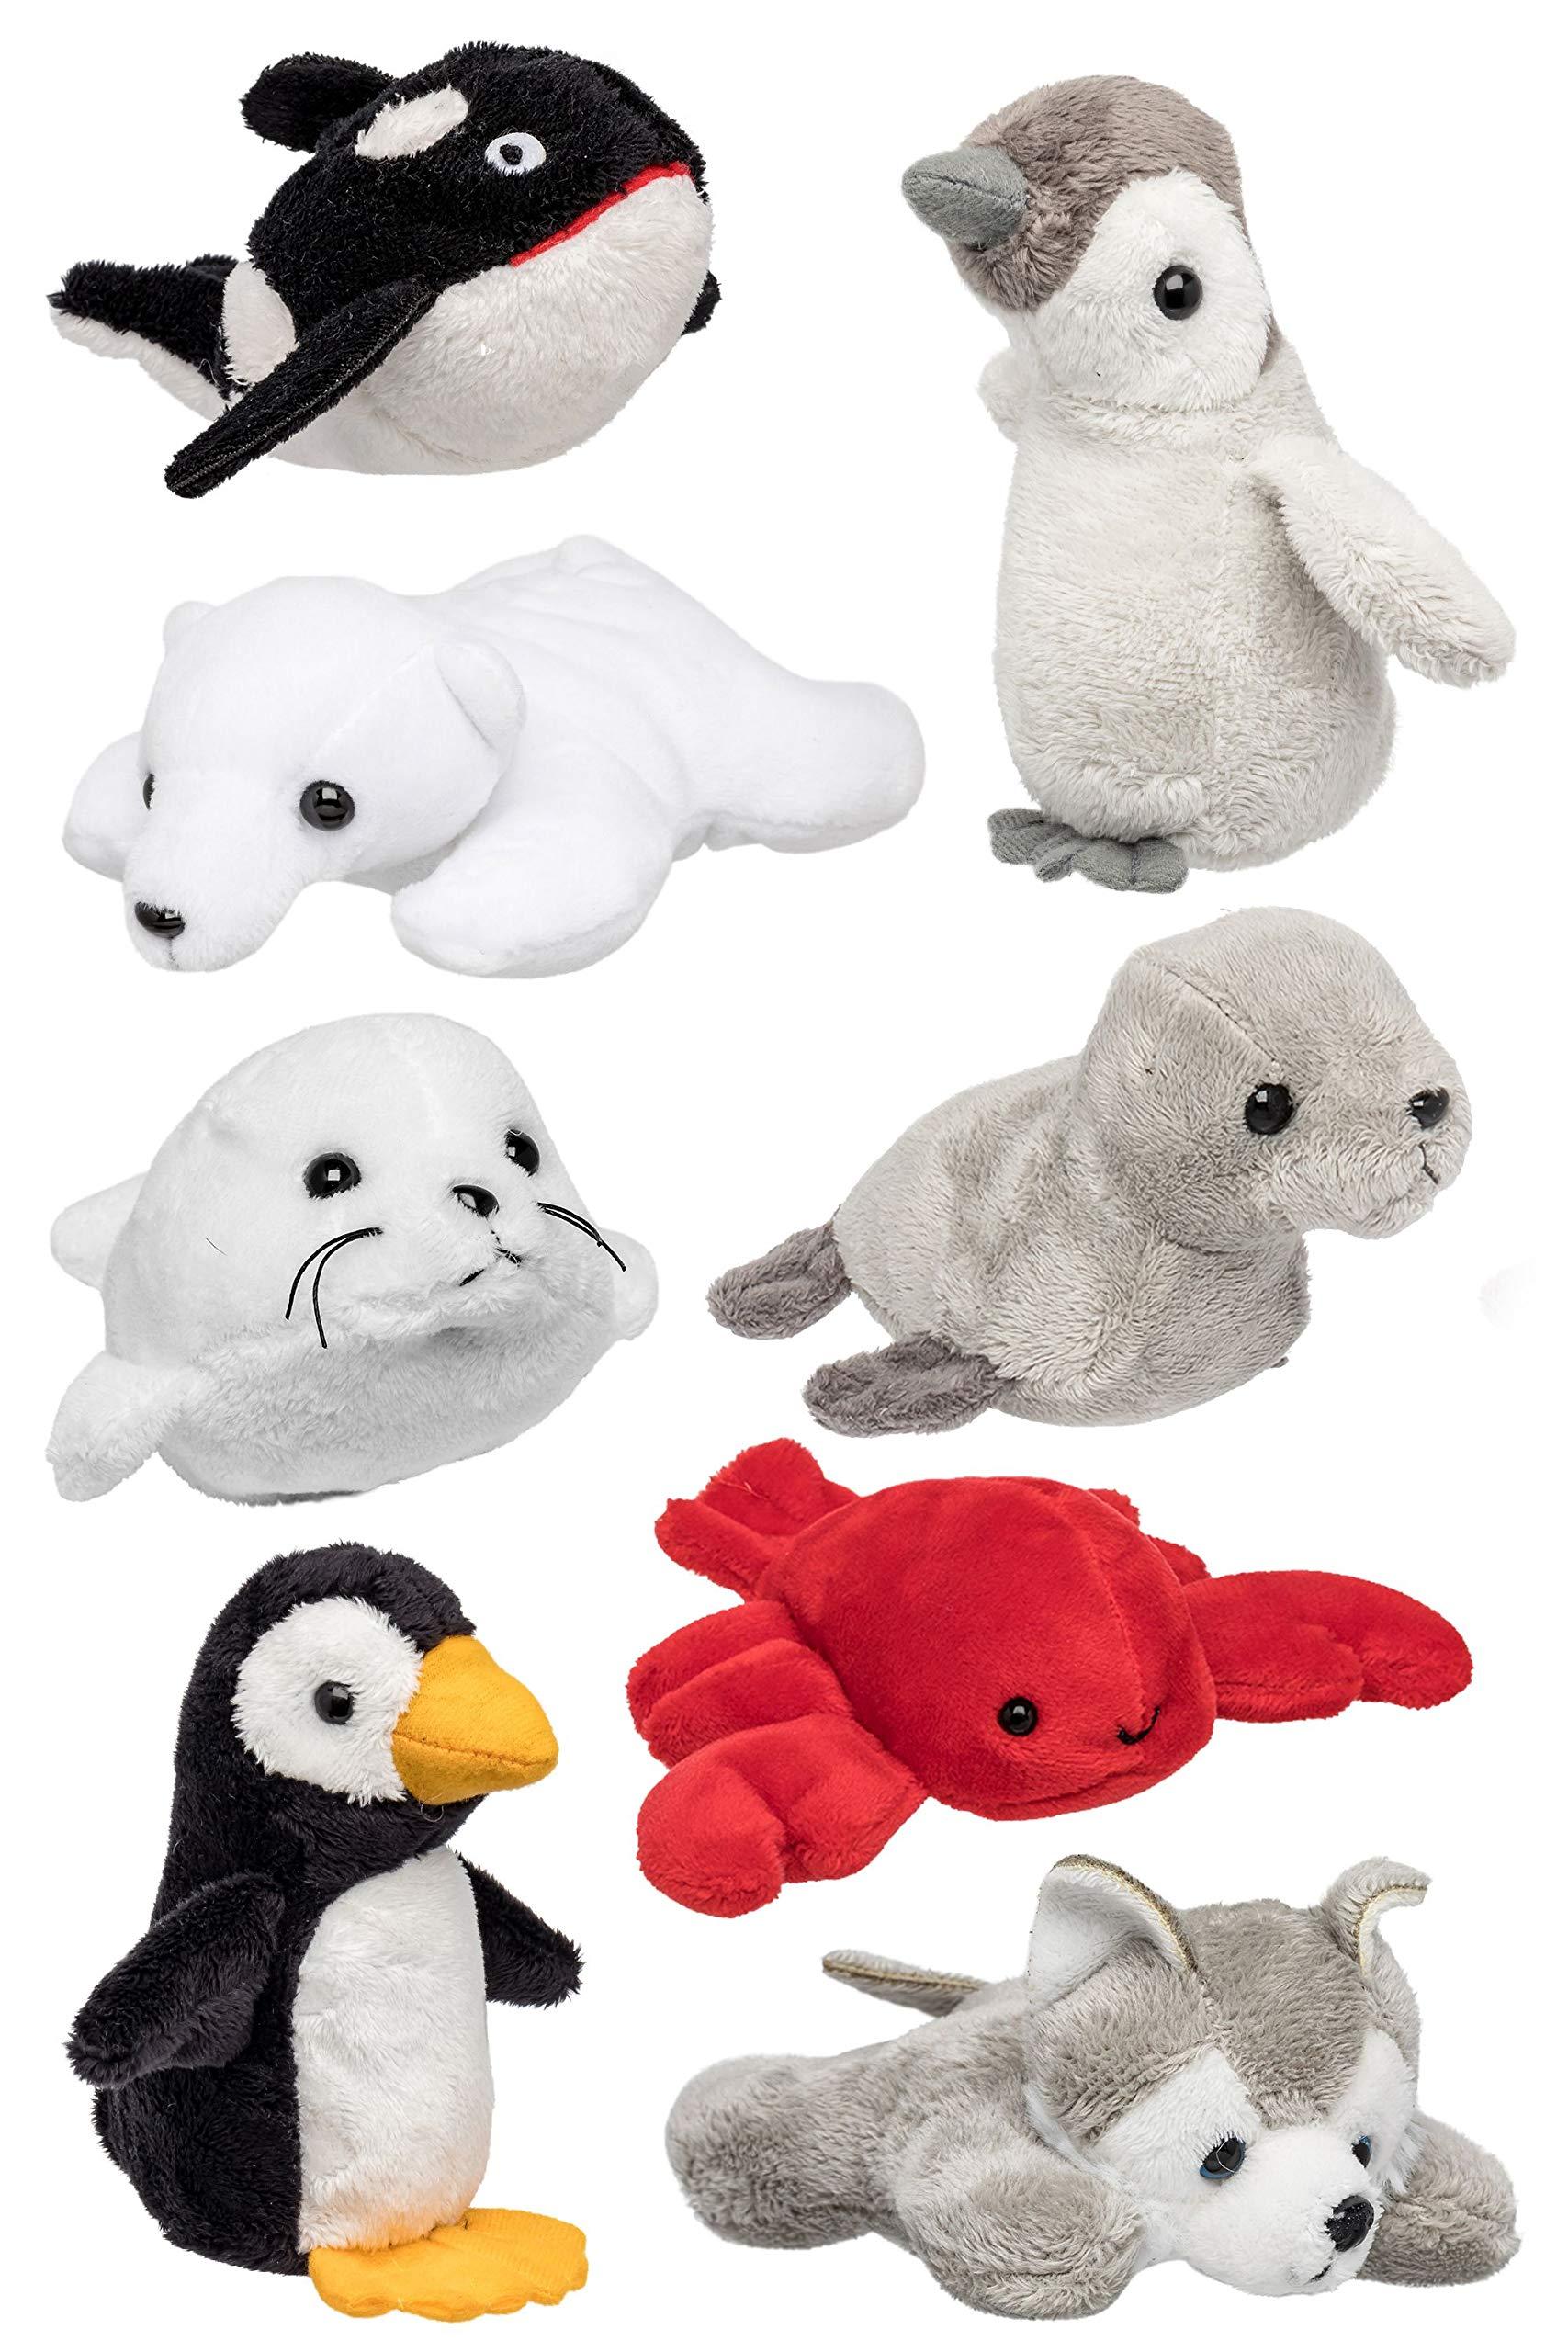 Wildlife Tree (8 Pack) Arctic Mini 4 Inch Small Stuffed Animals, Variety of Animal Toys by Wildlife Tree